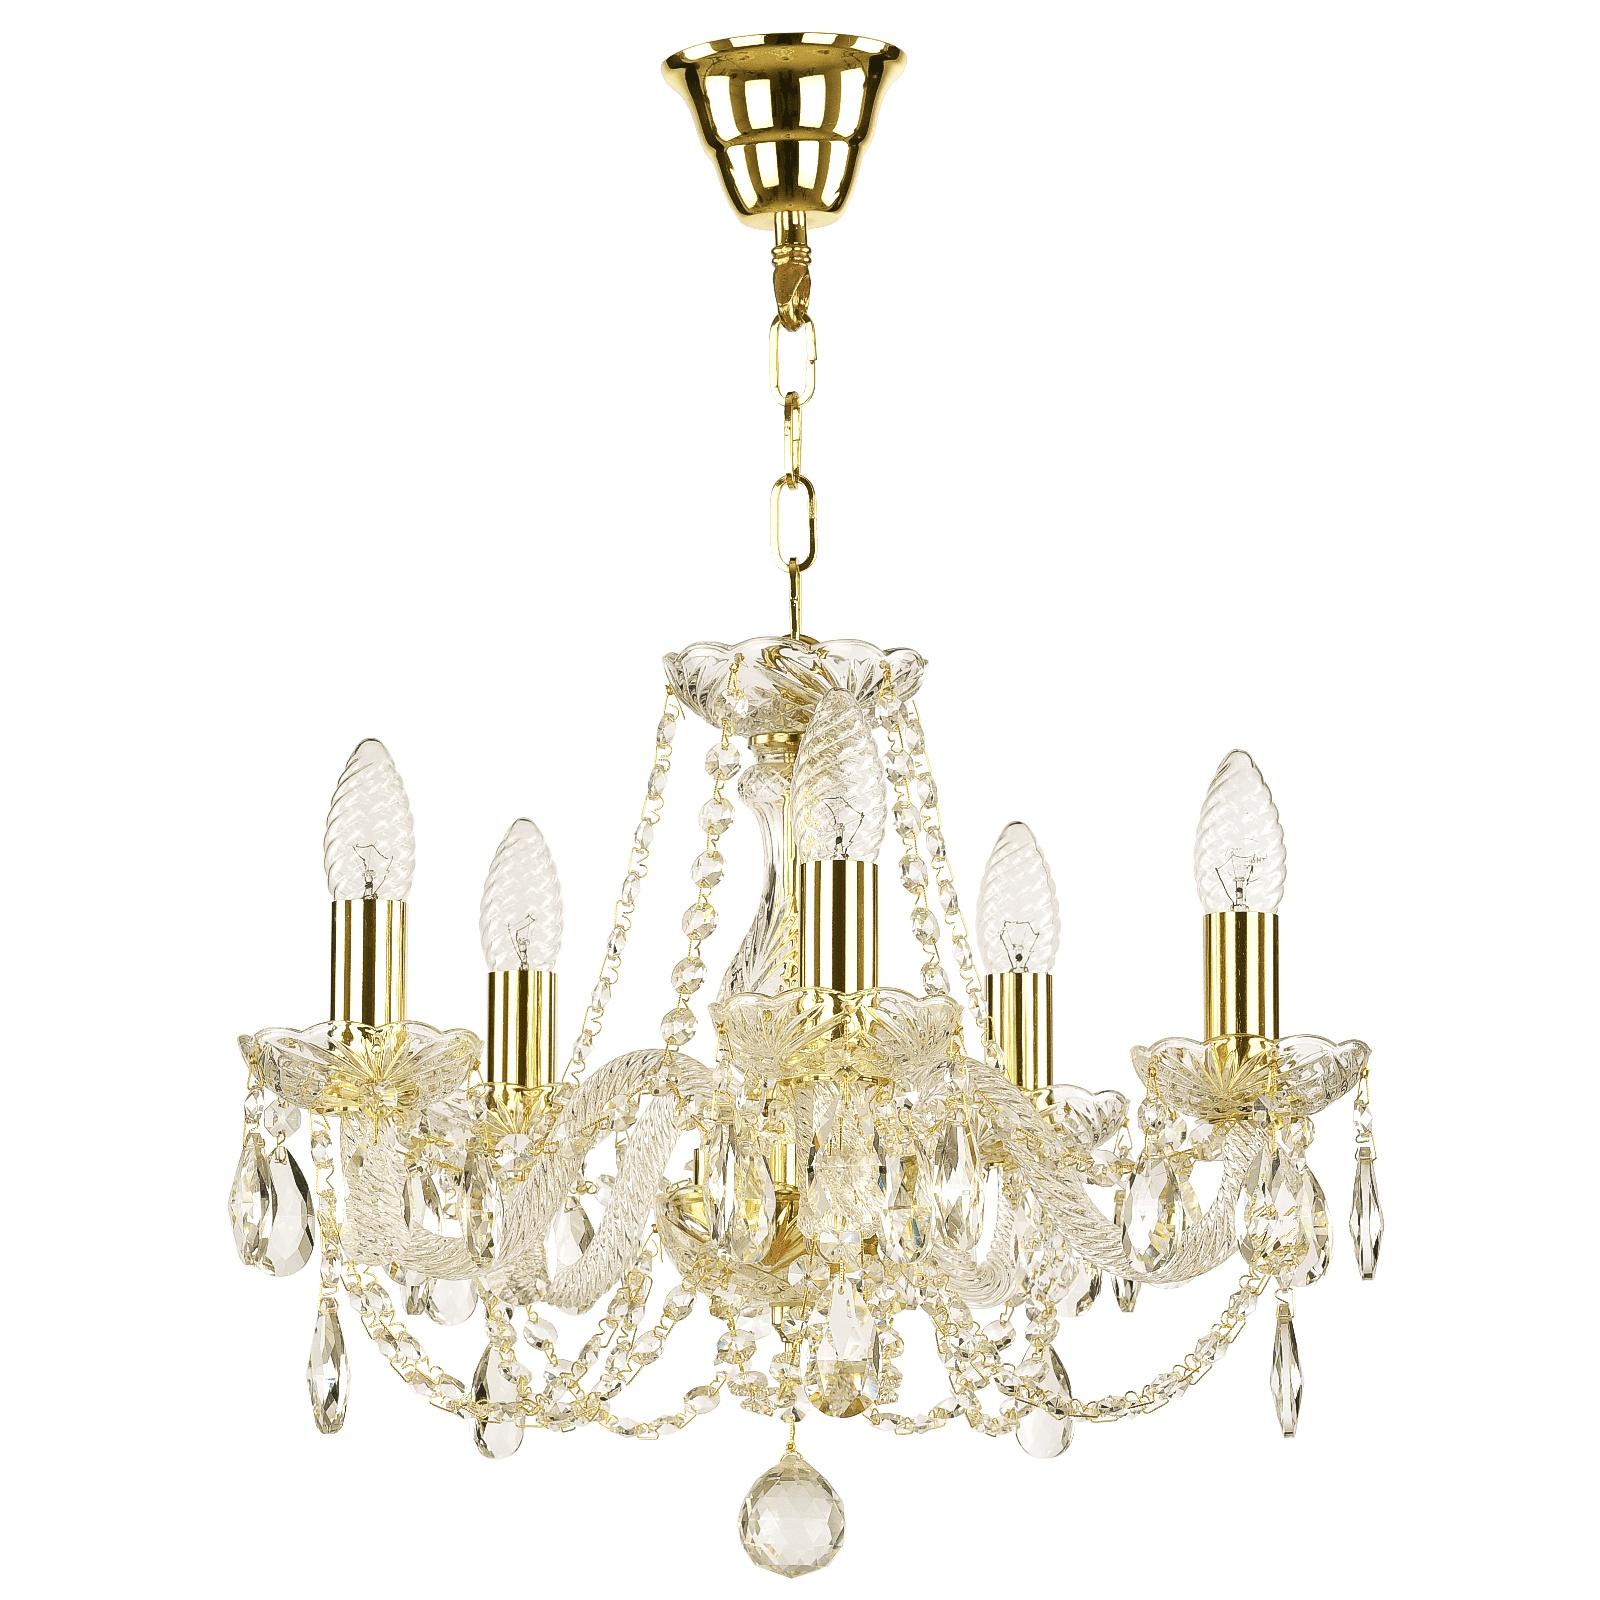 Потолочный светильник Bohemia Classic Light 101/5/141 G, E14, 40W Вт бра bohemia art classic 11 26 10 26 3 141 gd b